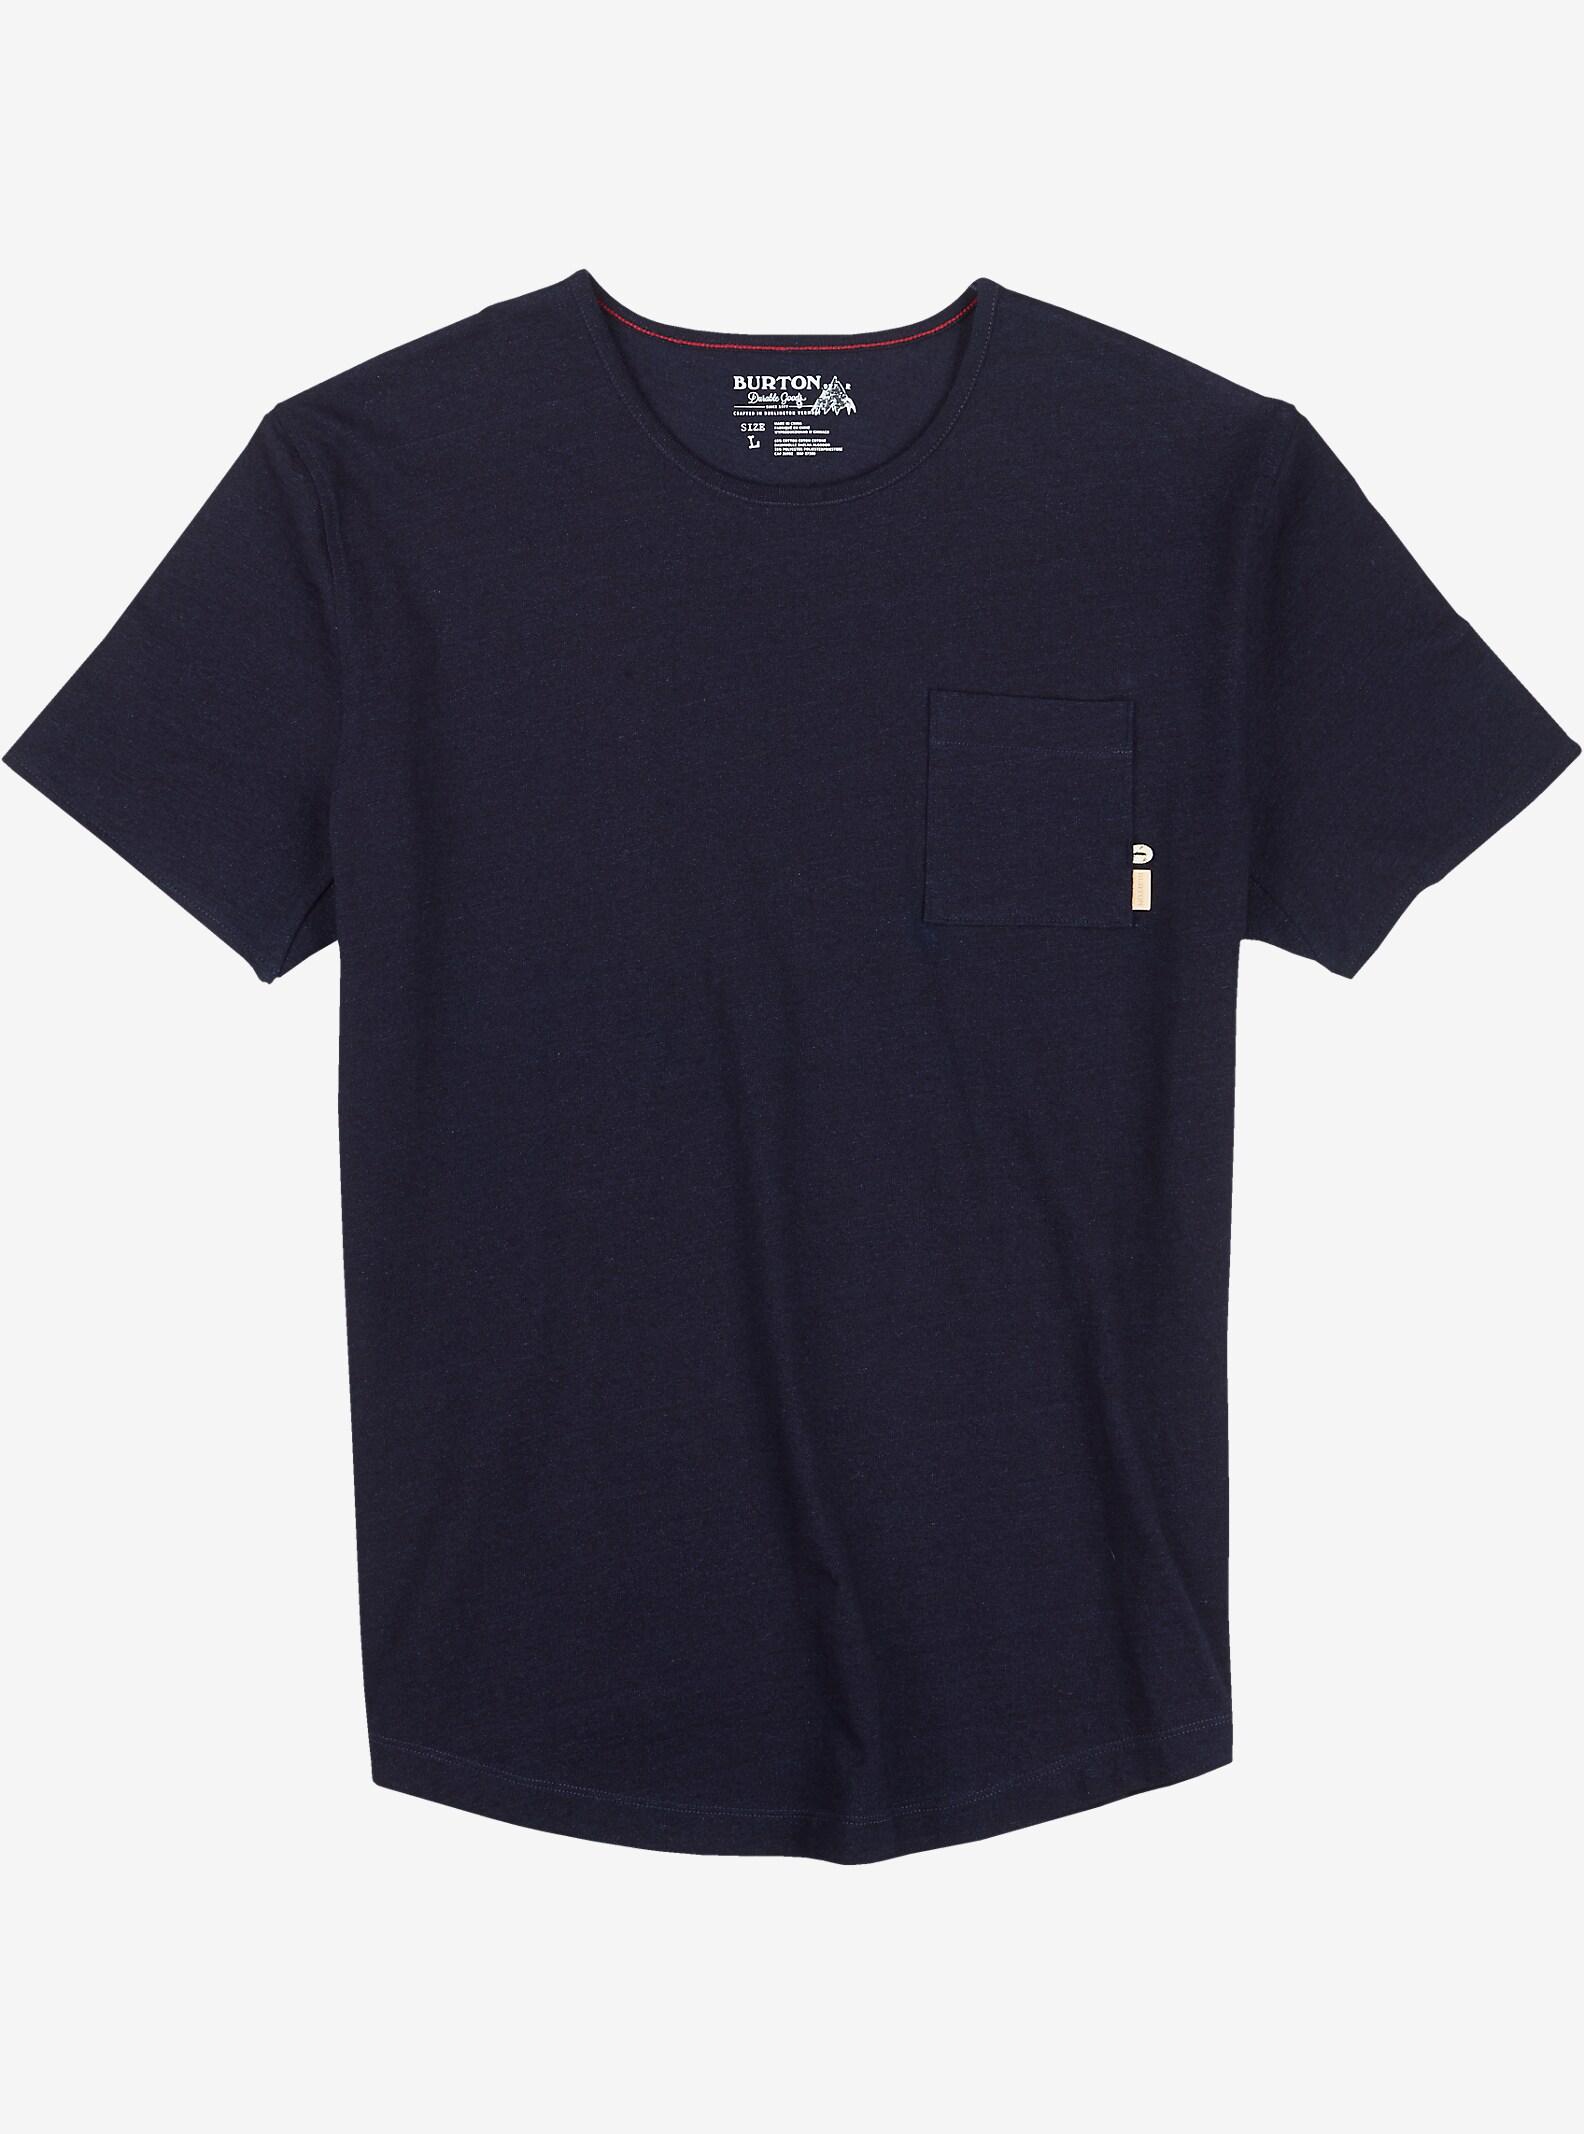 Burton Reed Short Sleeve Pocket T Shirt shown in Indigo